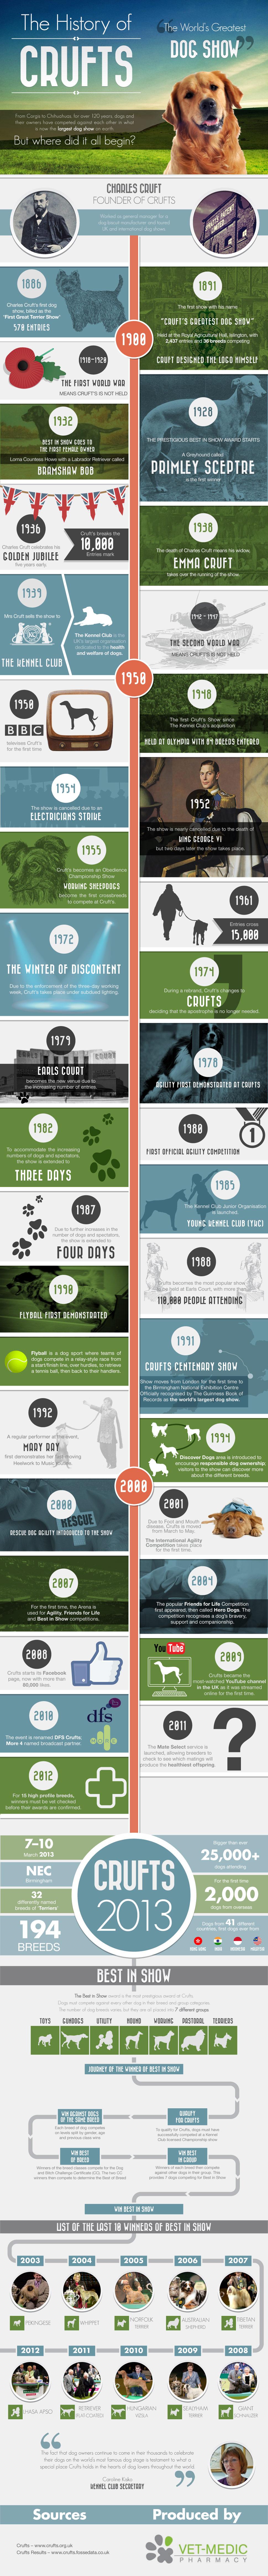 History of Crufts | ARKanimals